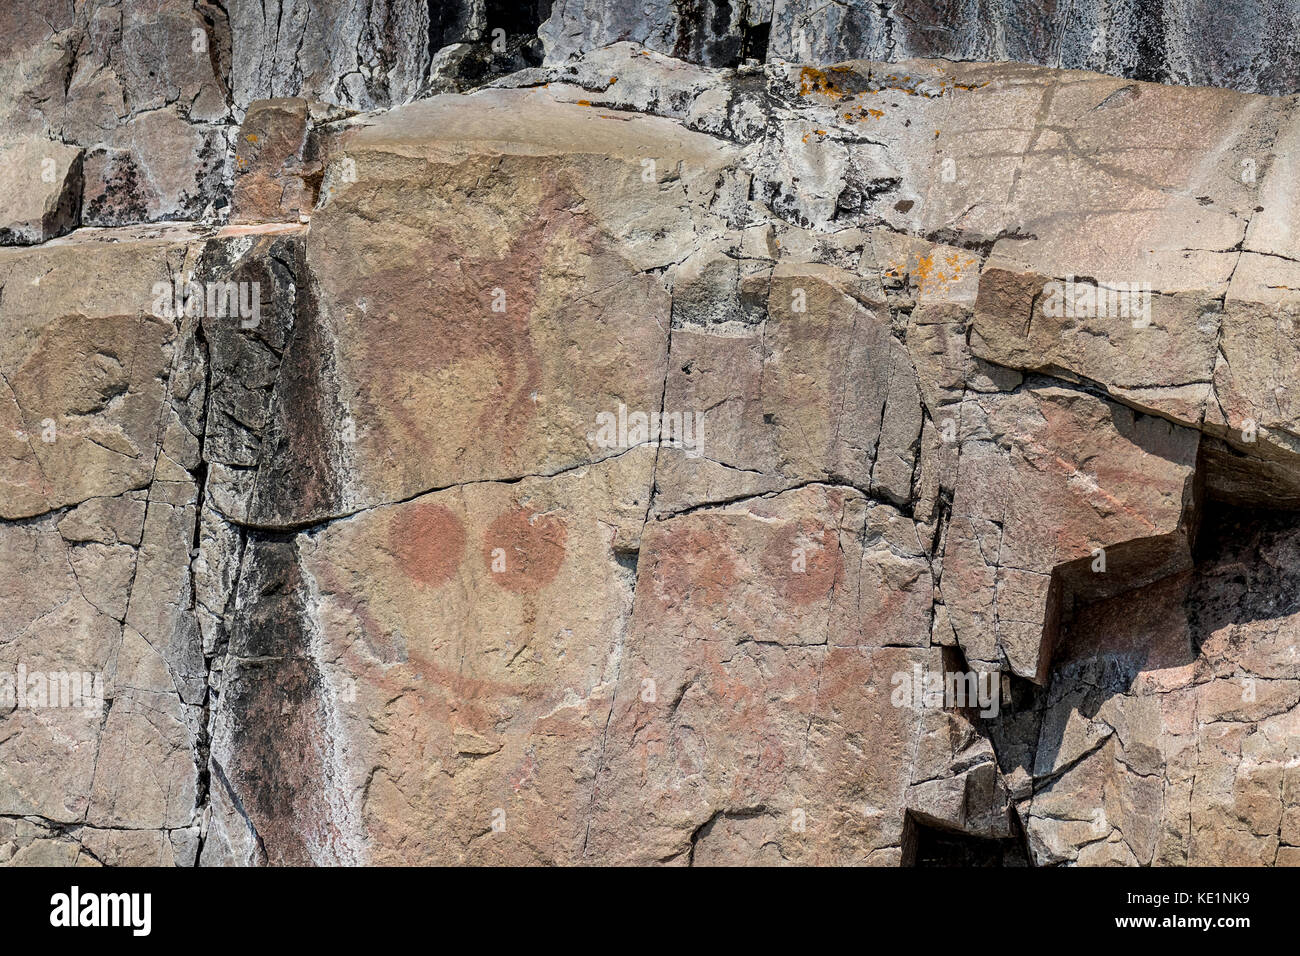 Agawa Rock Pictographs on Agawa Bay in Lake Superior Provincial Park, Ontario, Canada - Stock Image